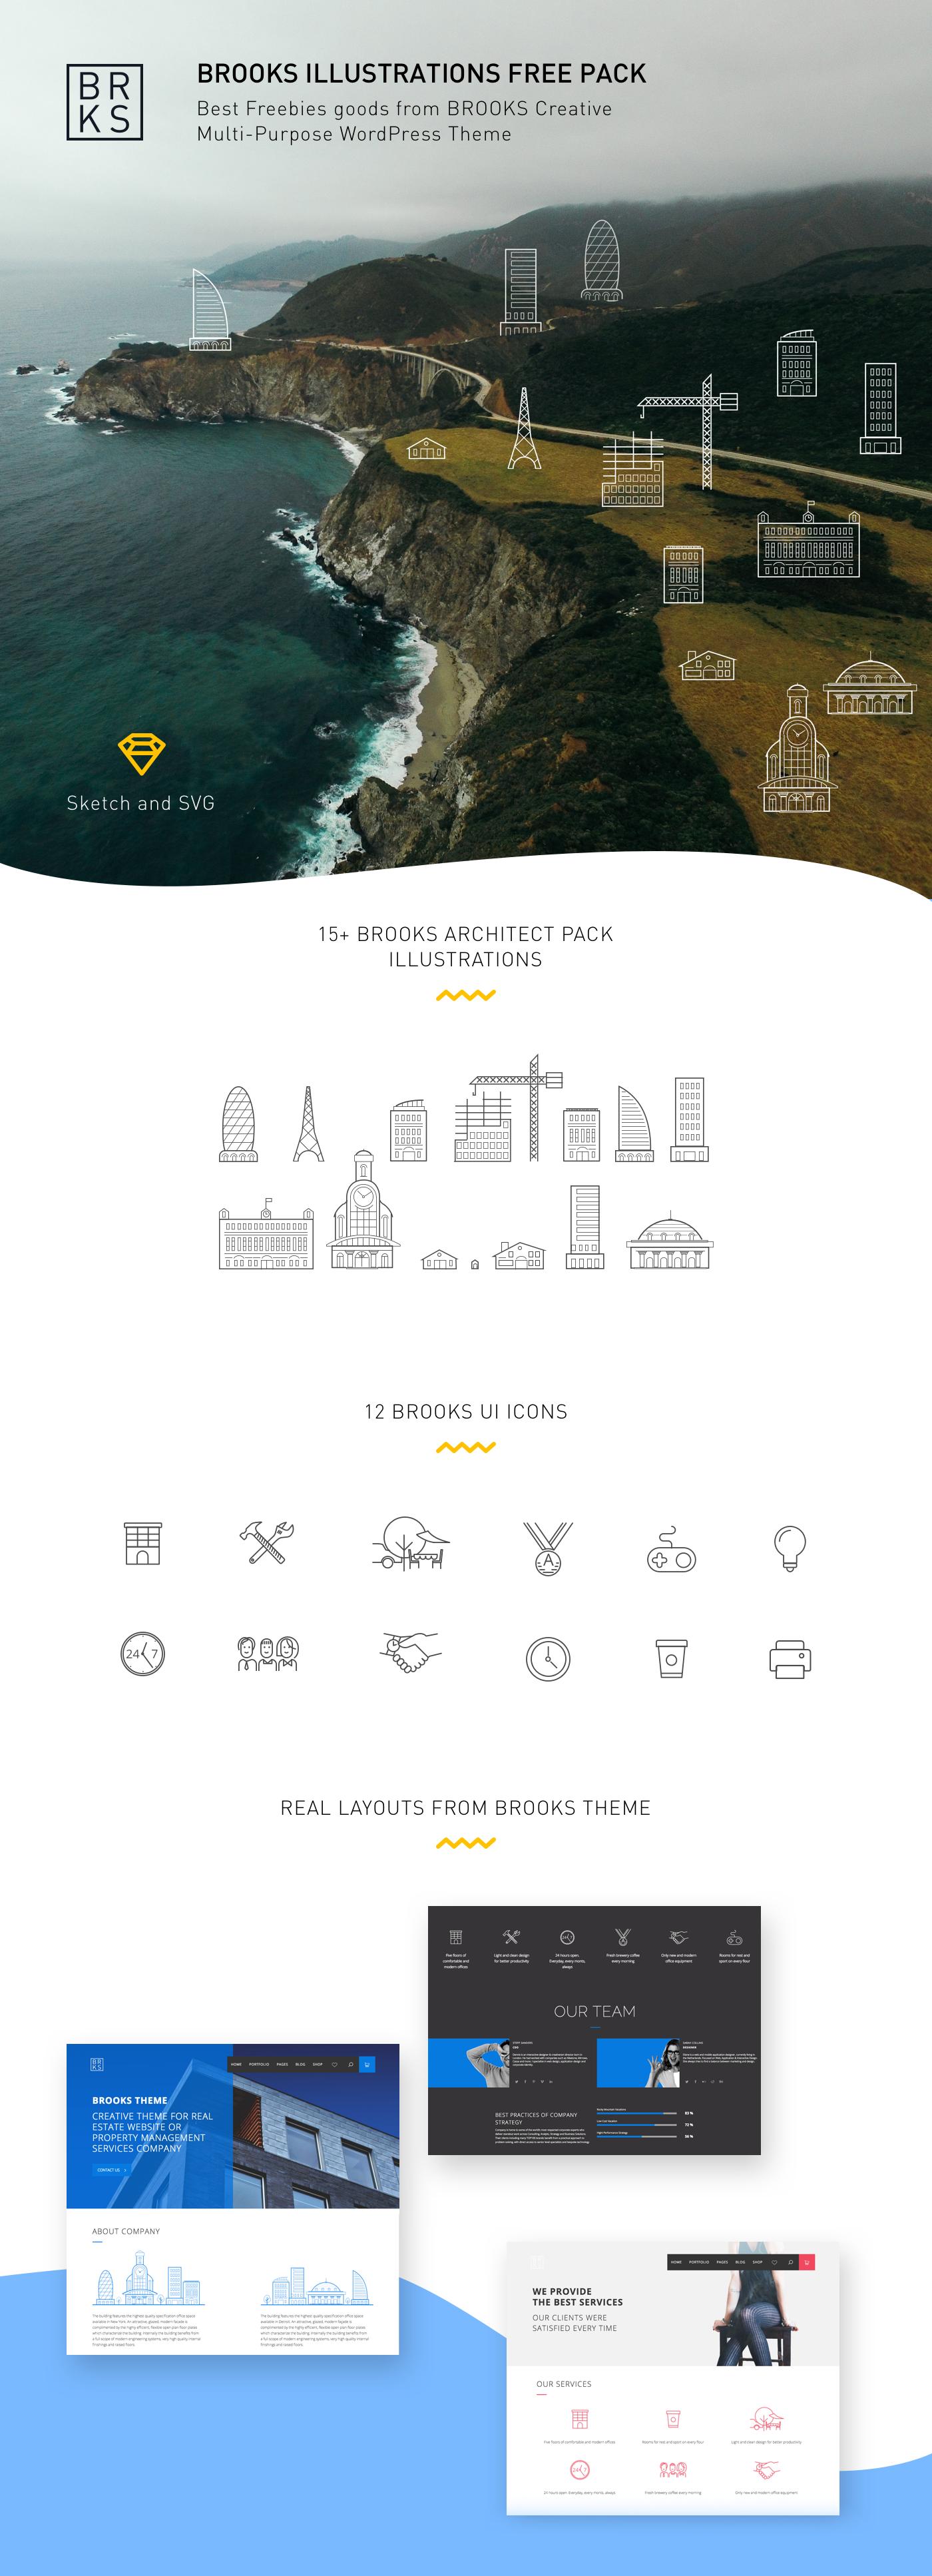 wordpress illustrations freebe sketch free ION vector flat UI Icon